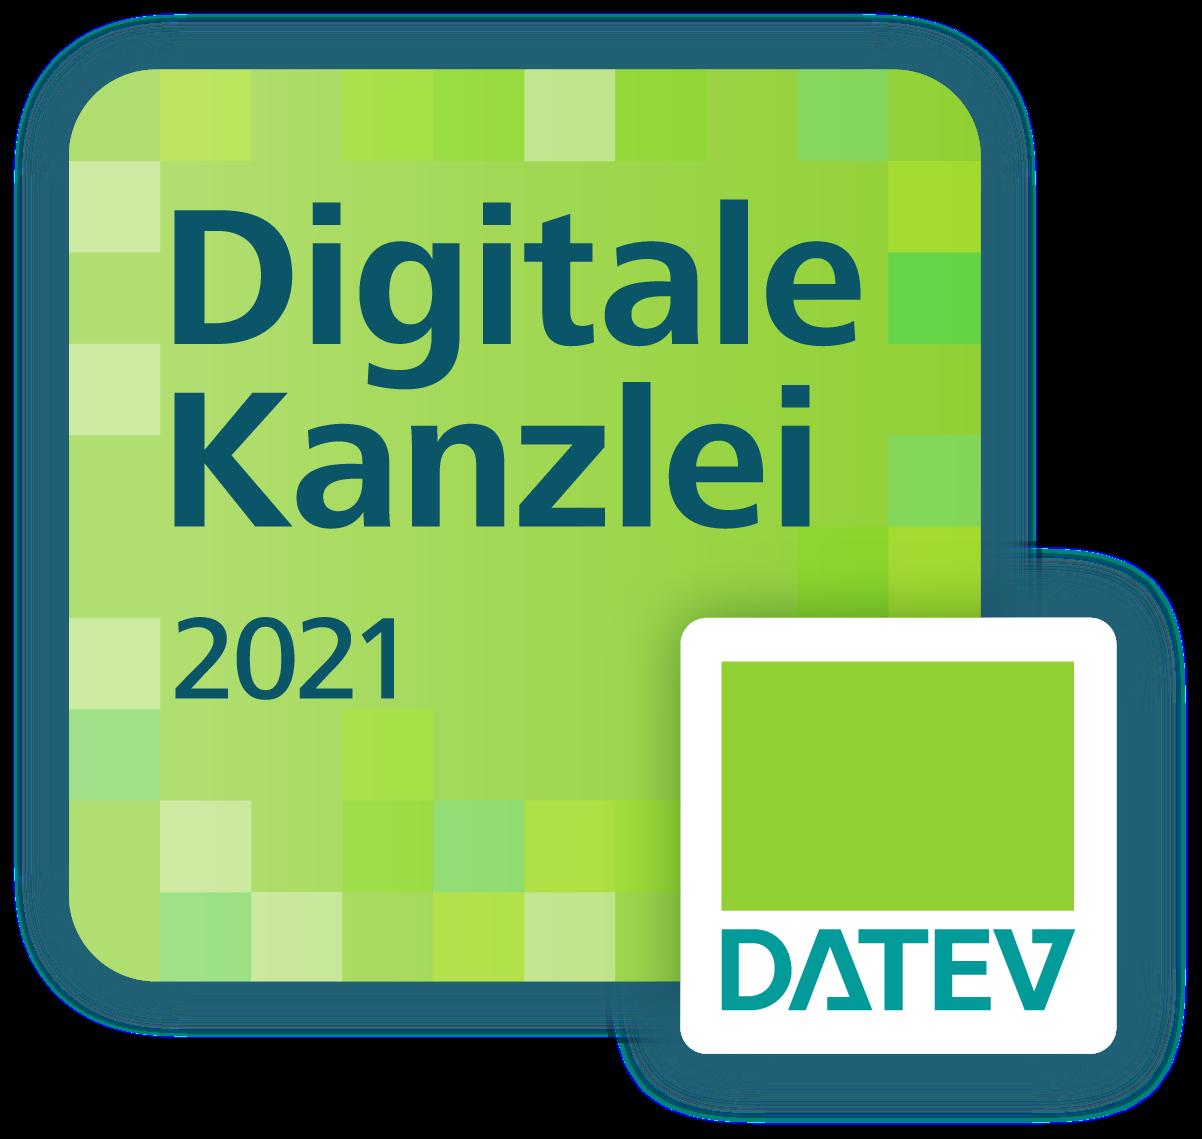 Label Digitale Kanzlei